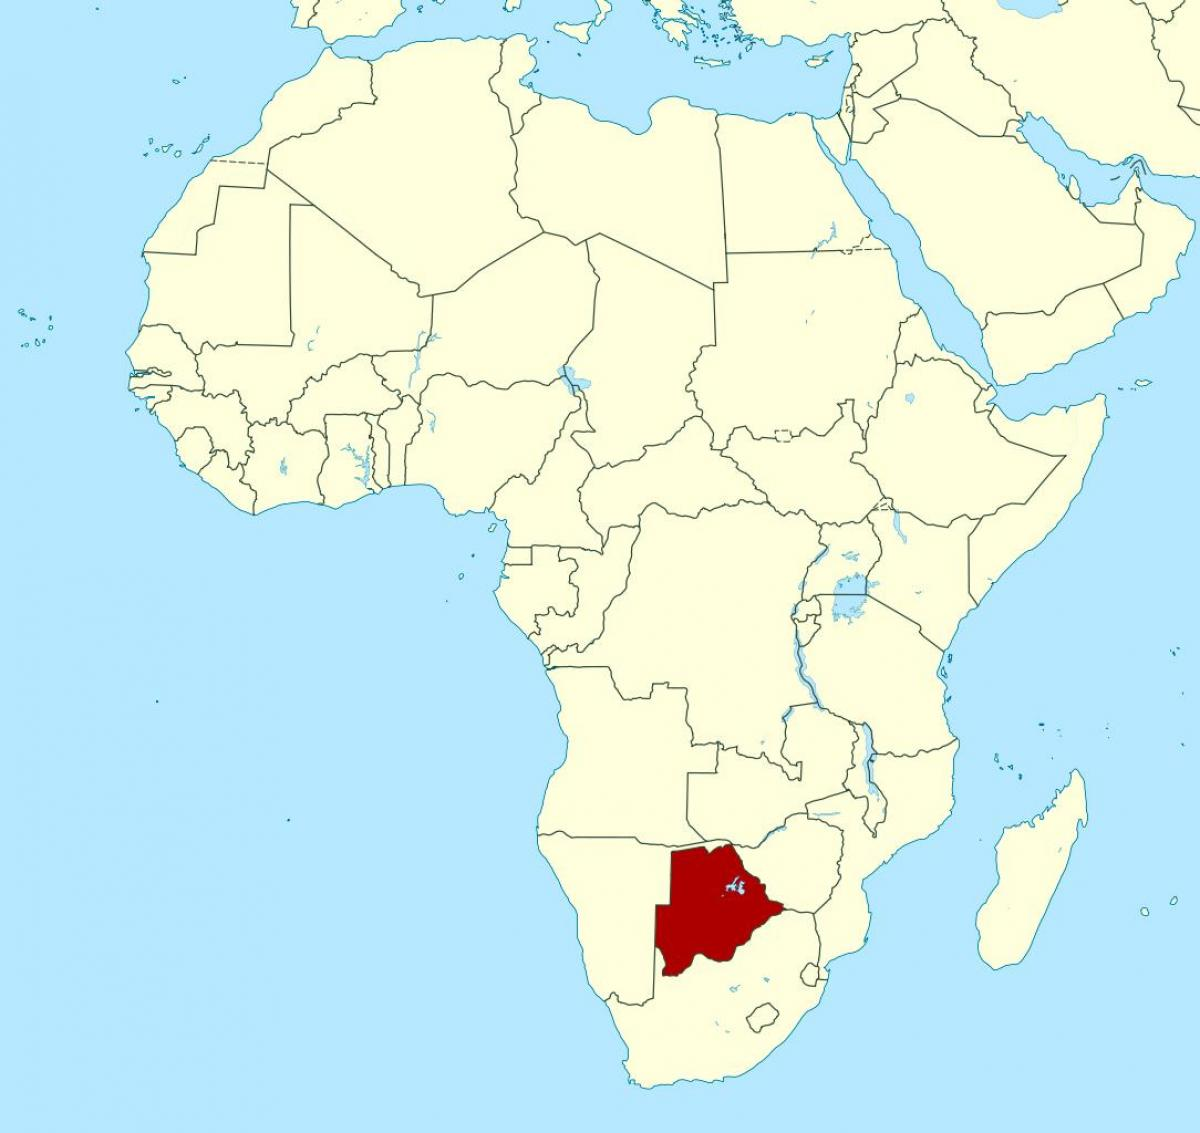 Botswana South Africa Map.Botswana Africa Map Map Of Botswana Africa Southern Africa Africa